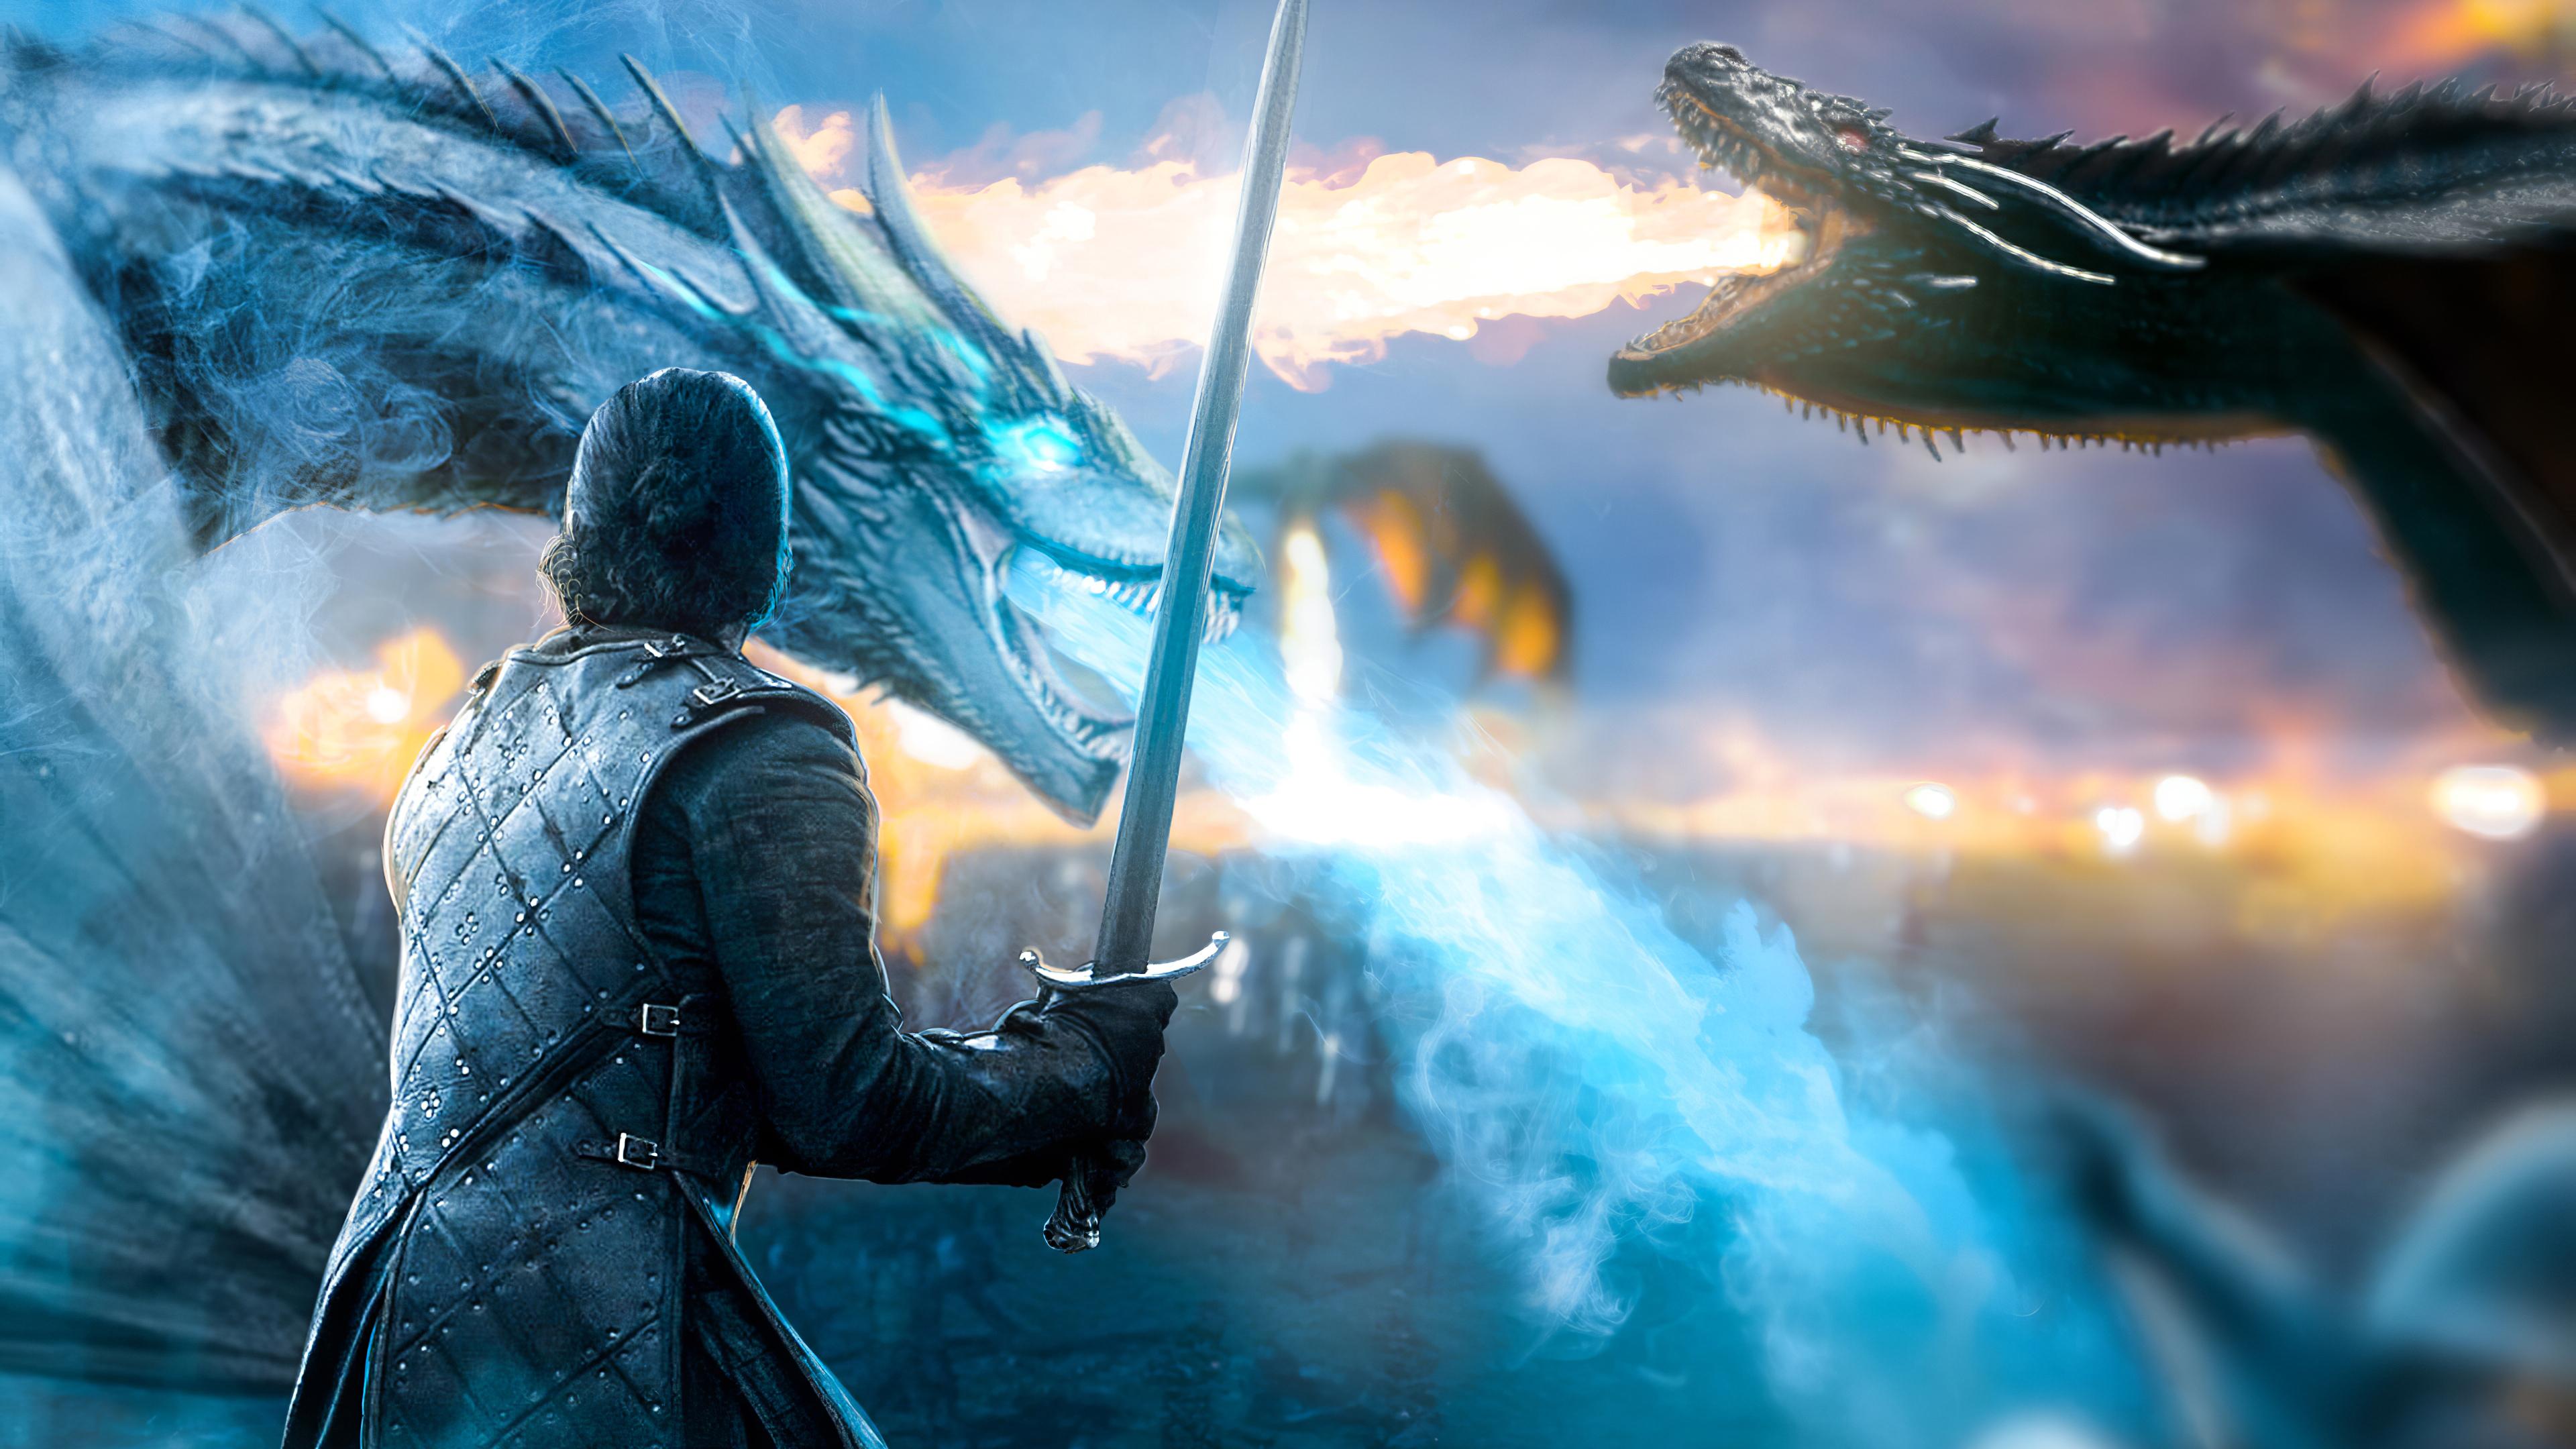 Jon Snow Game Of Thrones Dragon, HD Tv